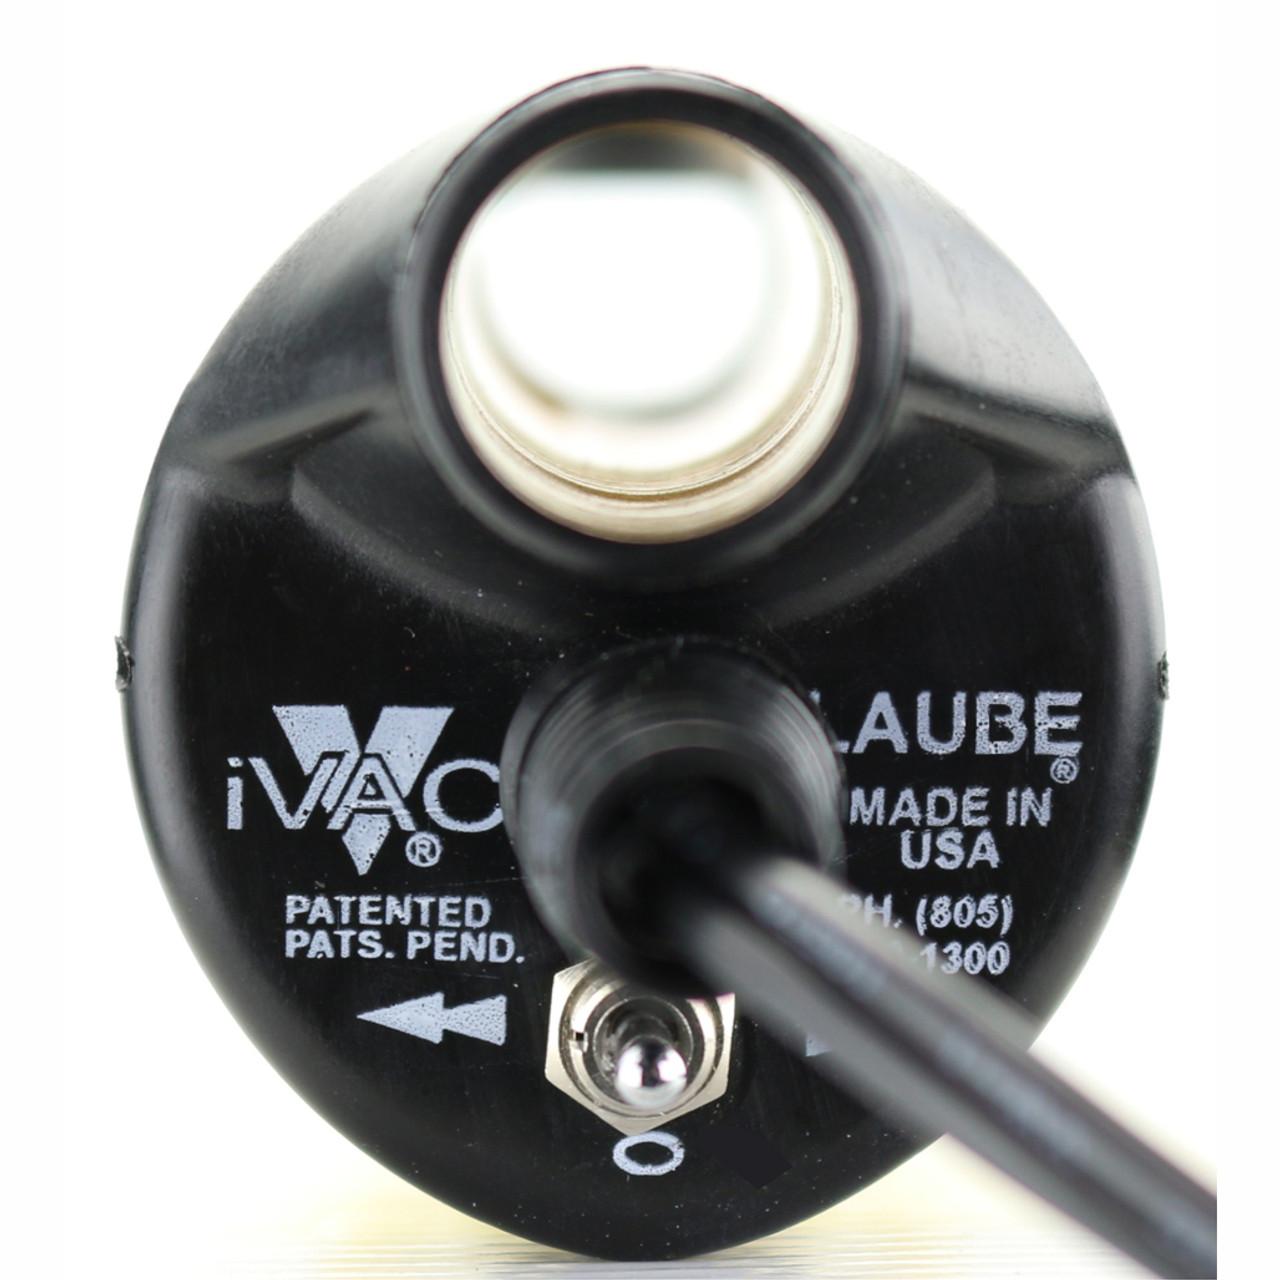 laube ivac 871 cowboy handpiece back switch view